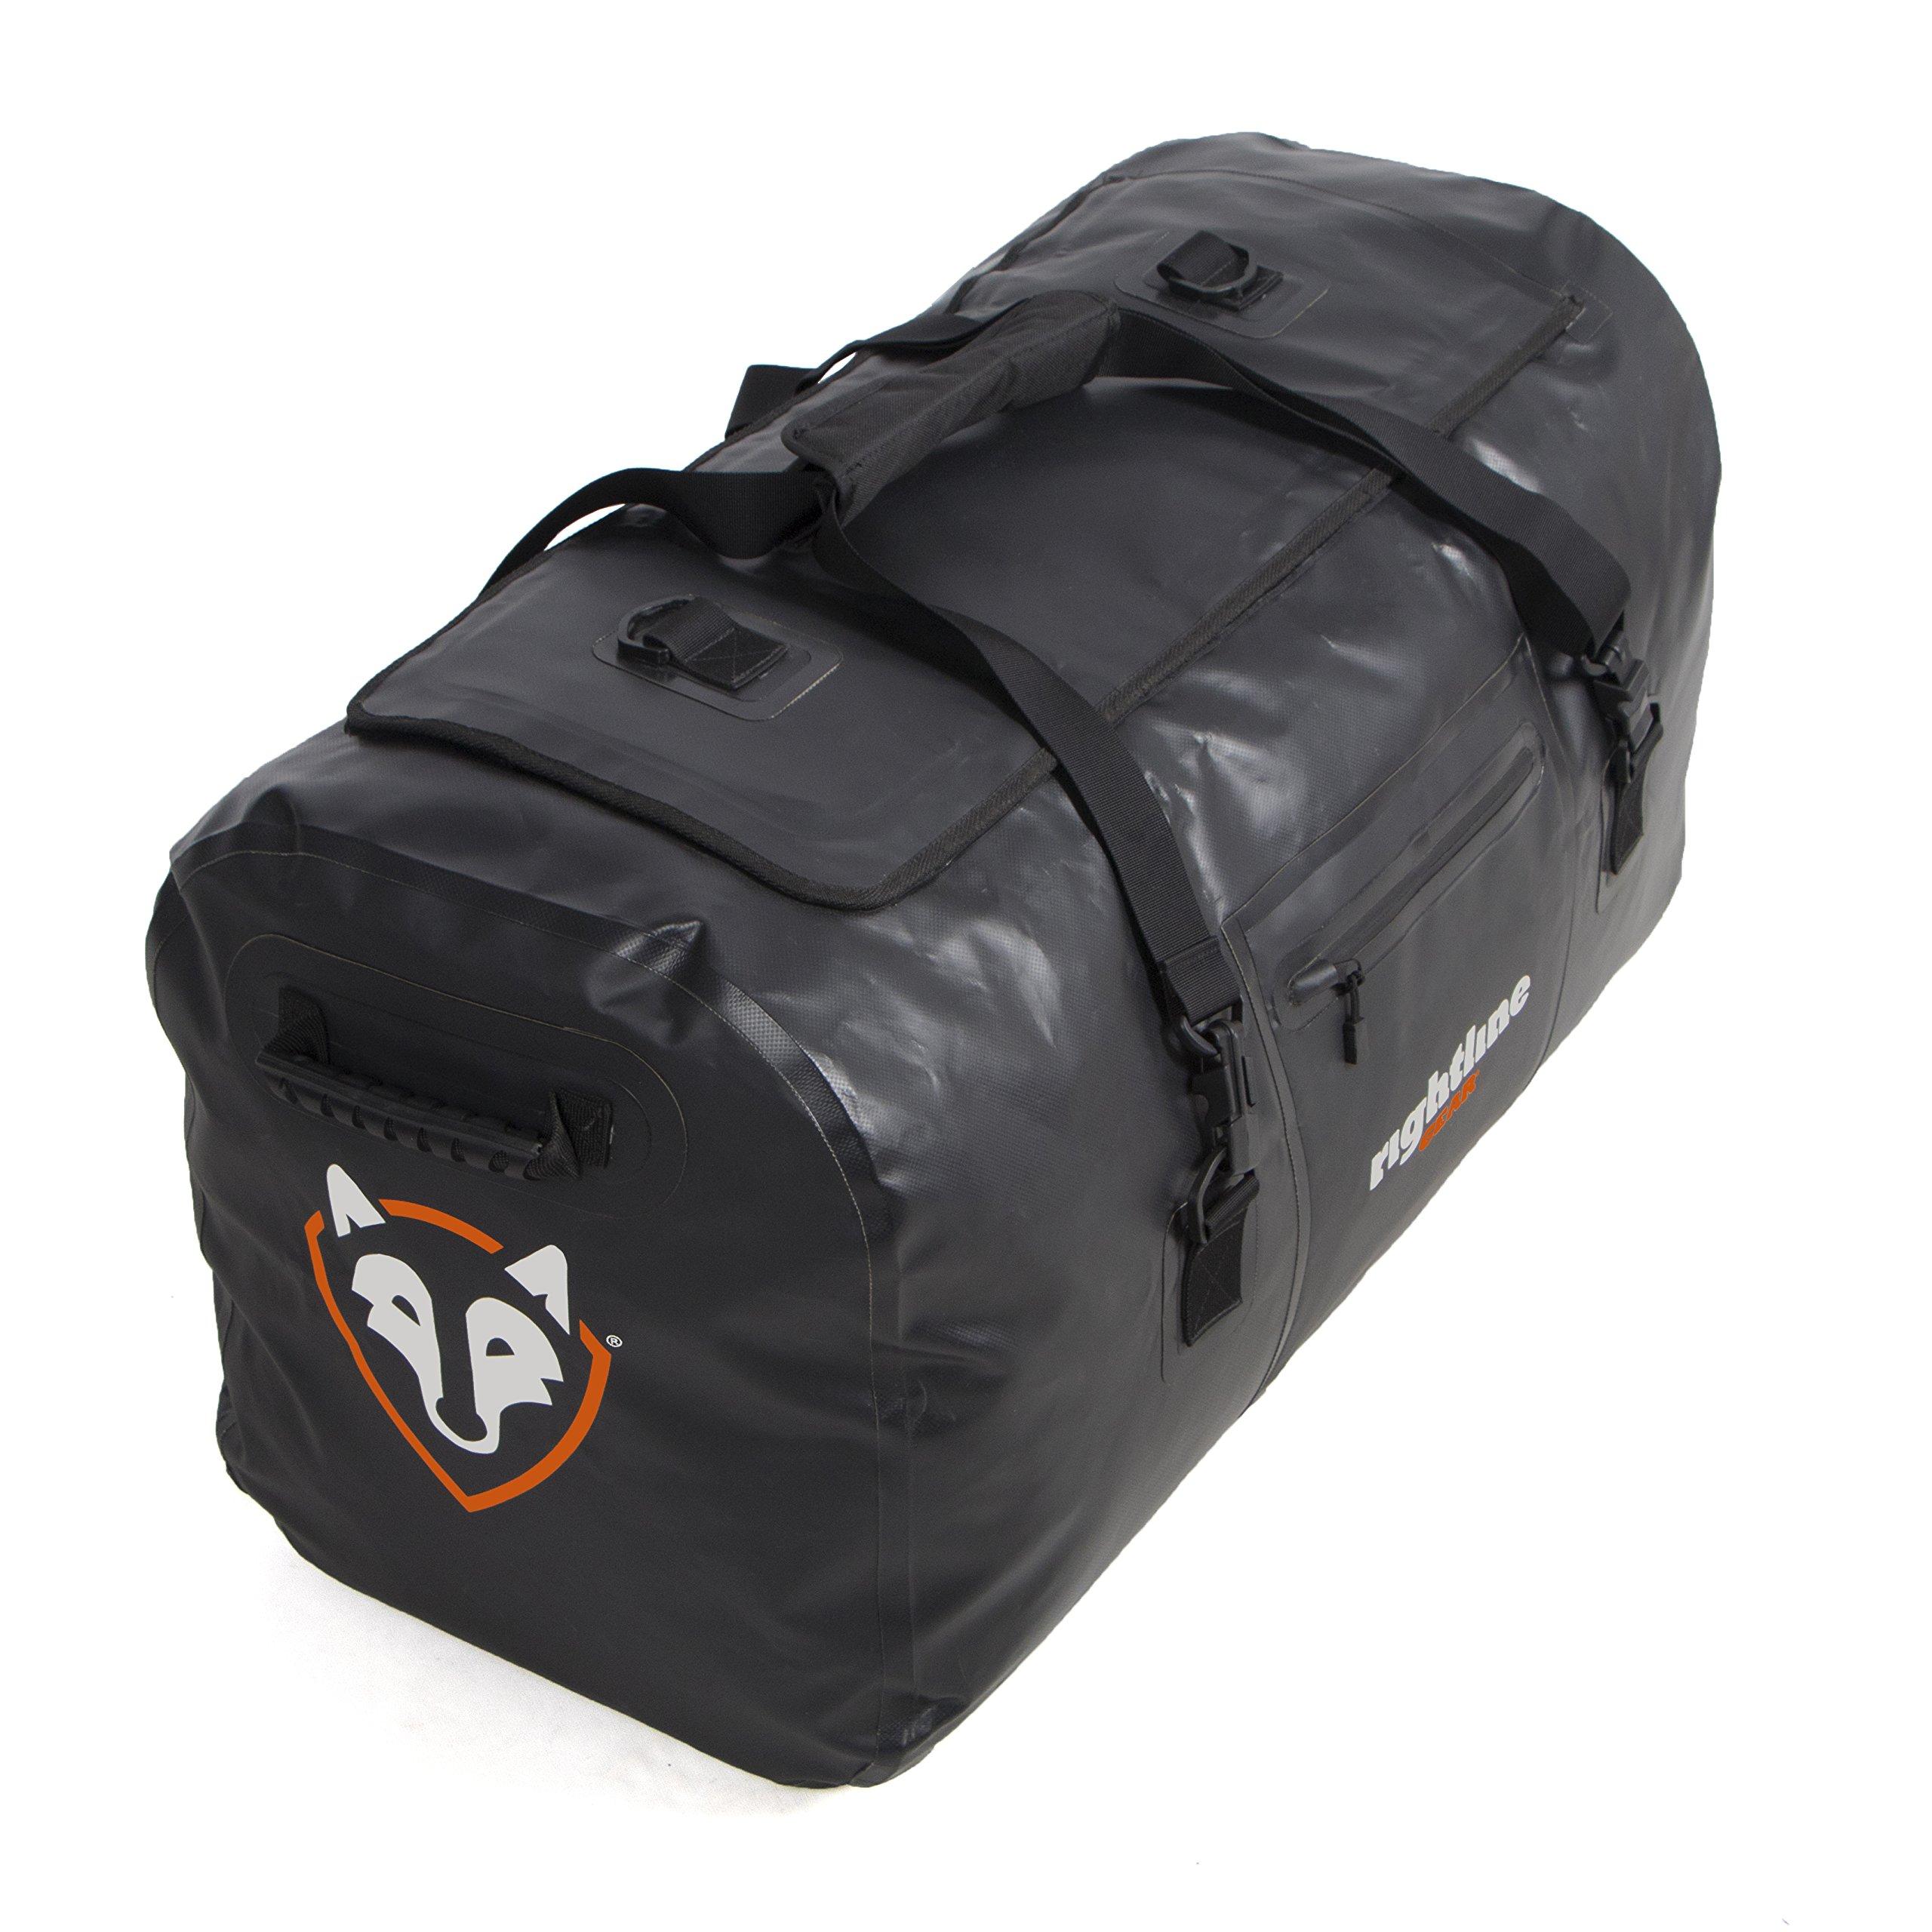 Rightline Gear 100J87-B 4x4 Duffle Bag (120L) by Rightline Gear (Image #1)